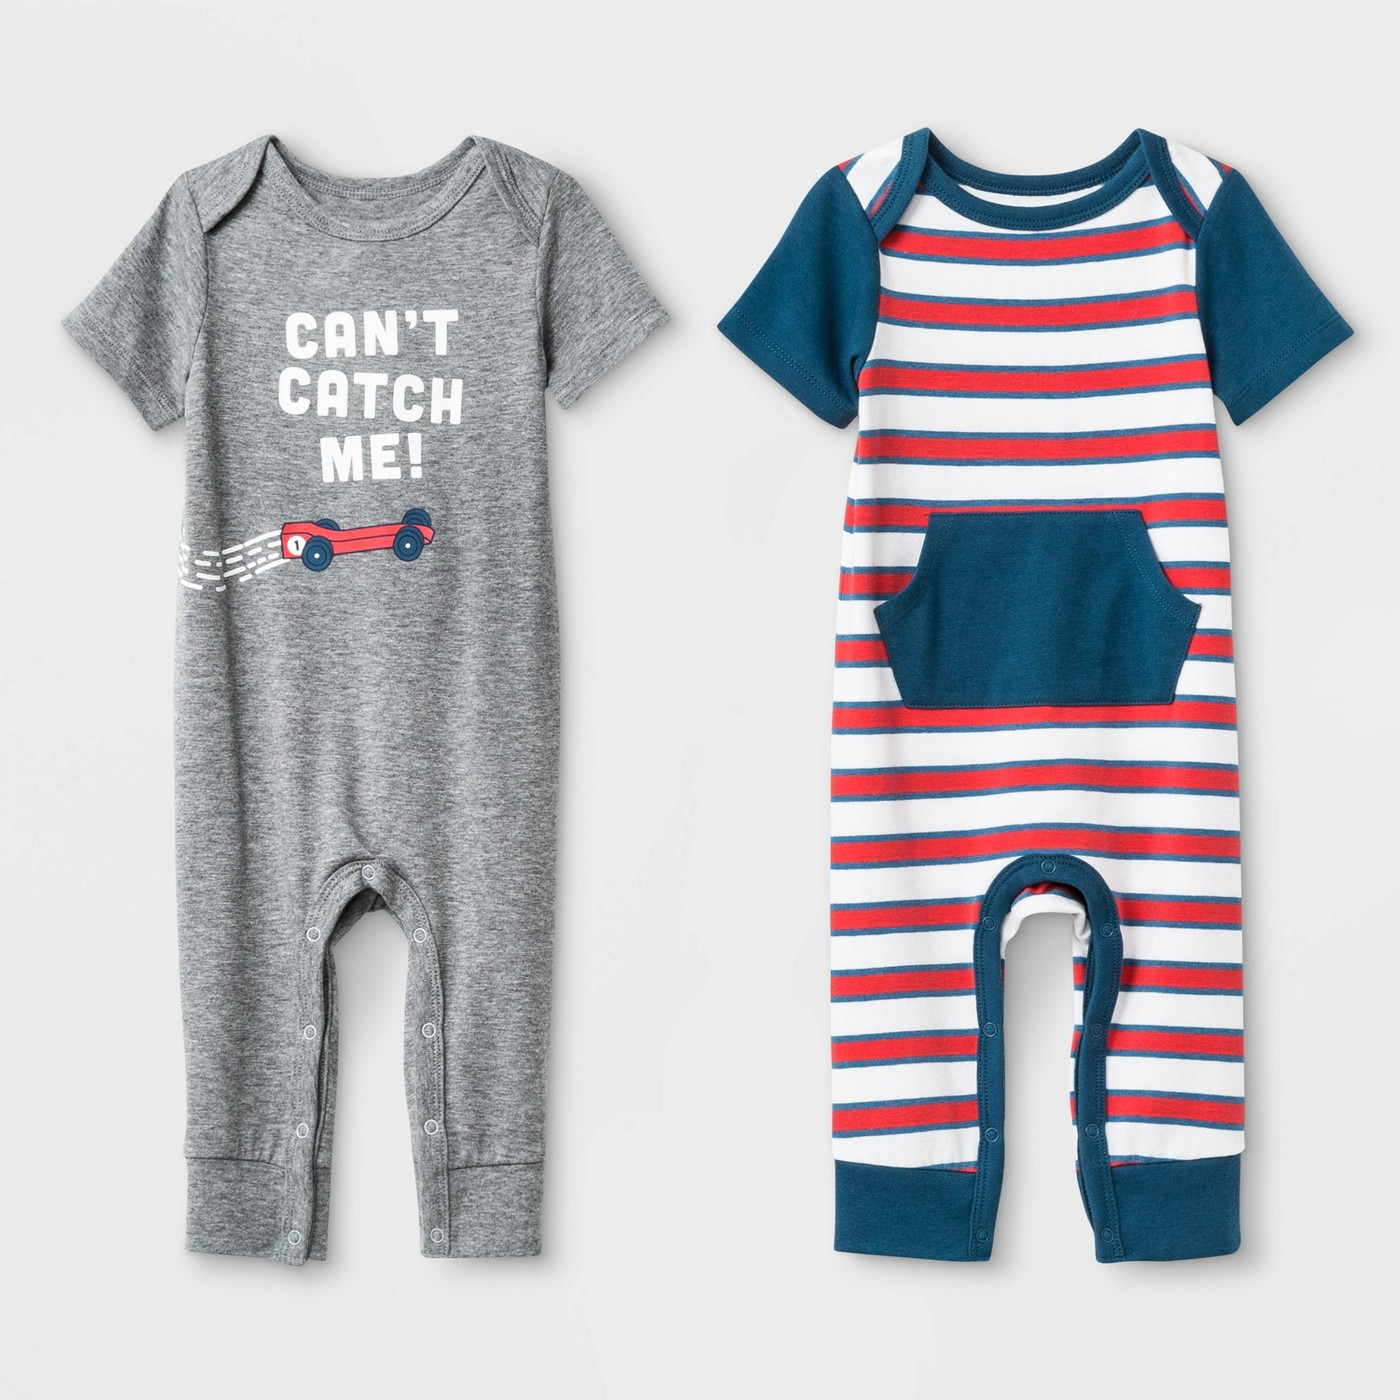 Baby Boys' Jersey Short Sleeve Lap Romper Set - Cat & Jack™ Heather Gray/White/Blue - image 1 of 2